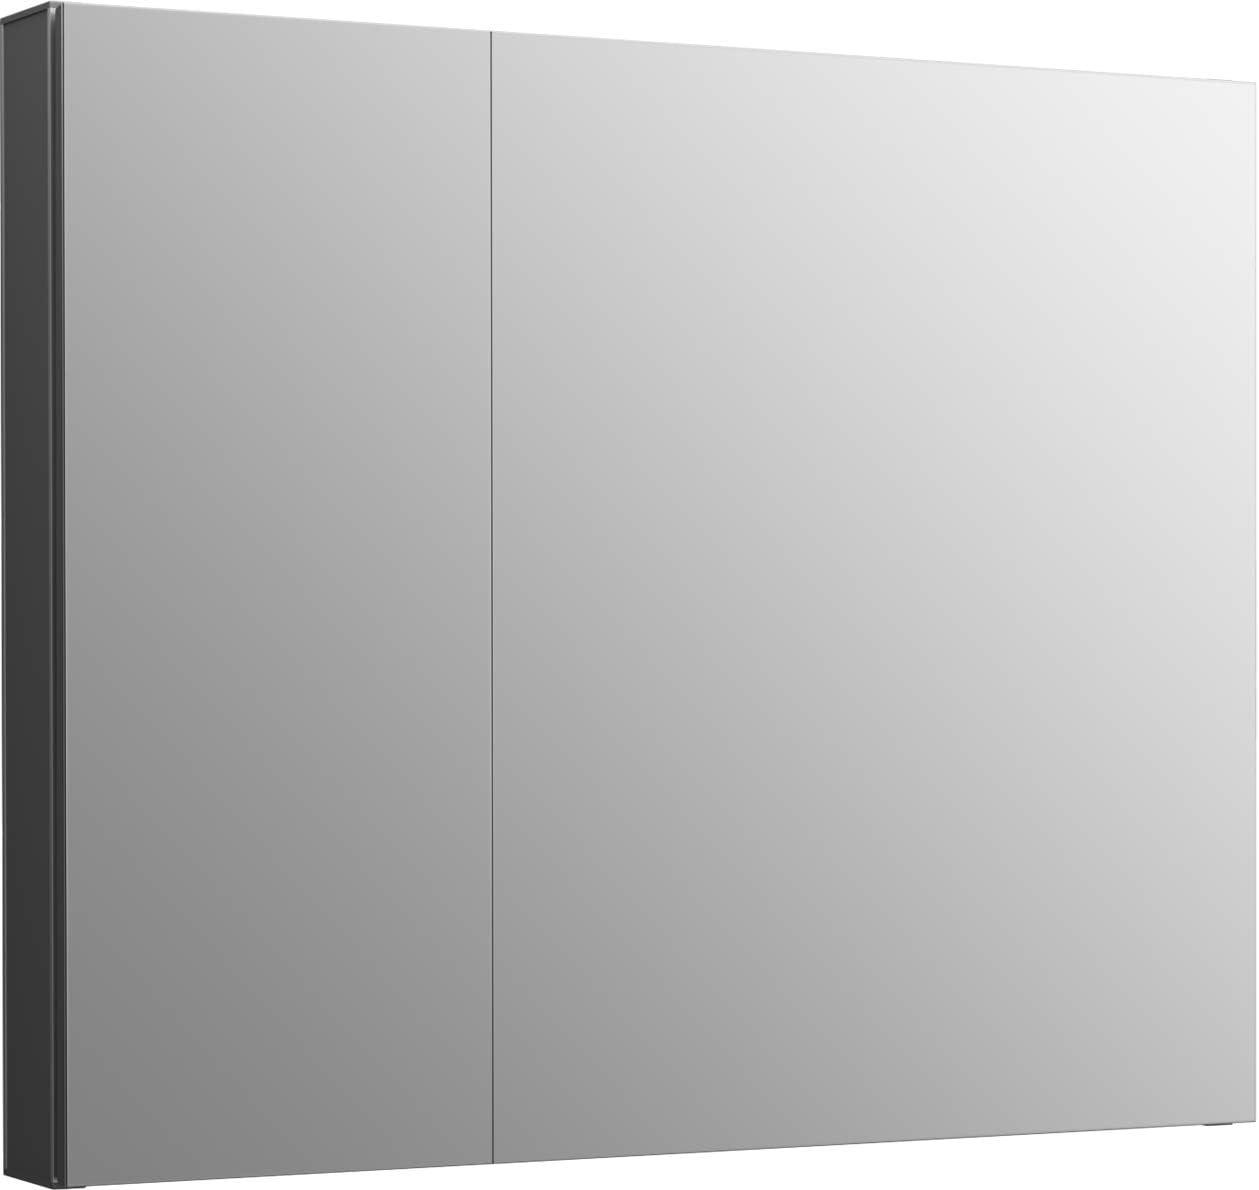 Kohler K-81146-DA1 Maxstow Frameless Surface Mount Bathroom Medicine Cabinet, 30 x 24 , Dark Anodized Aluminum